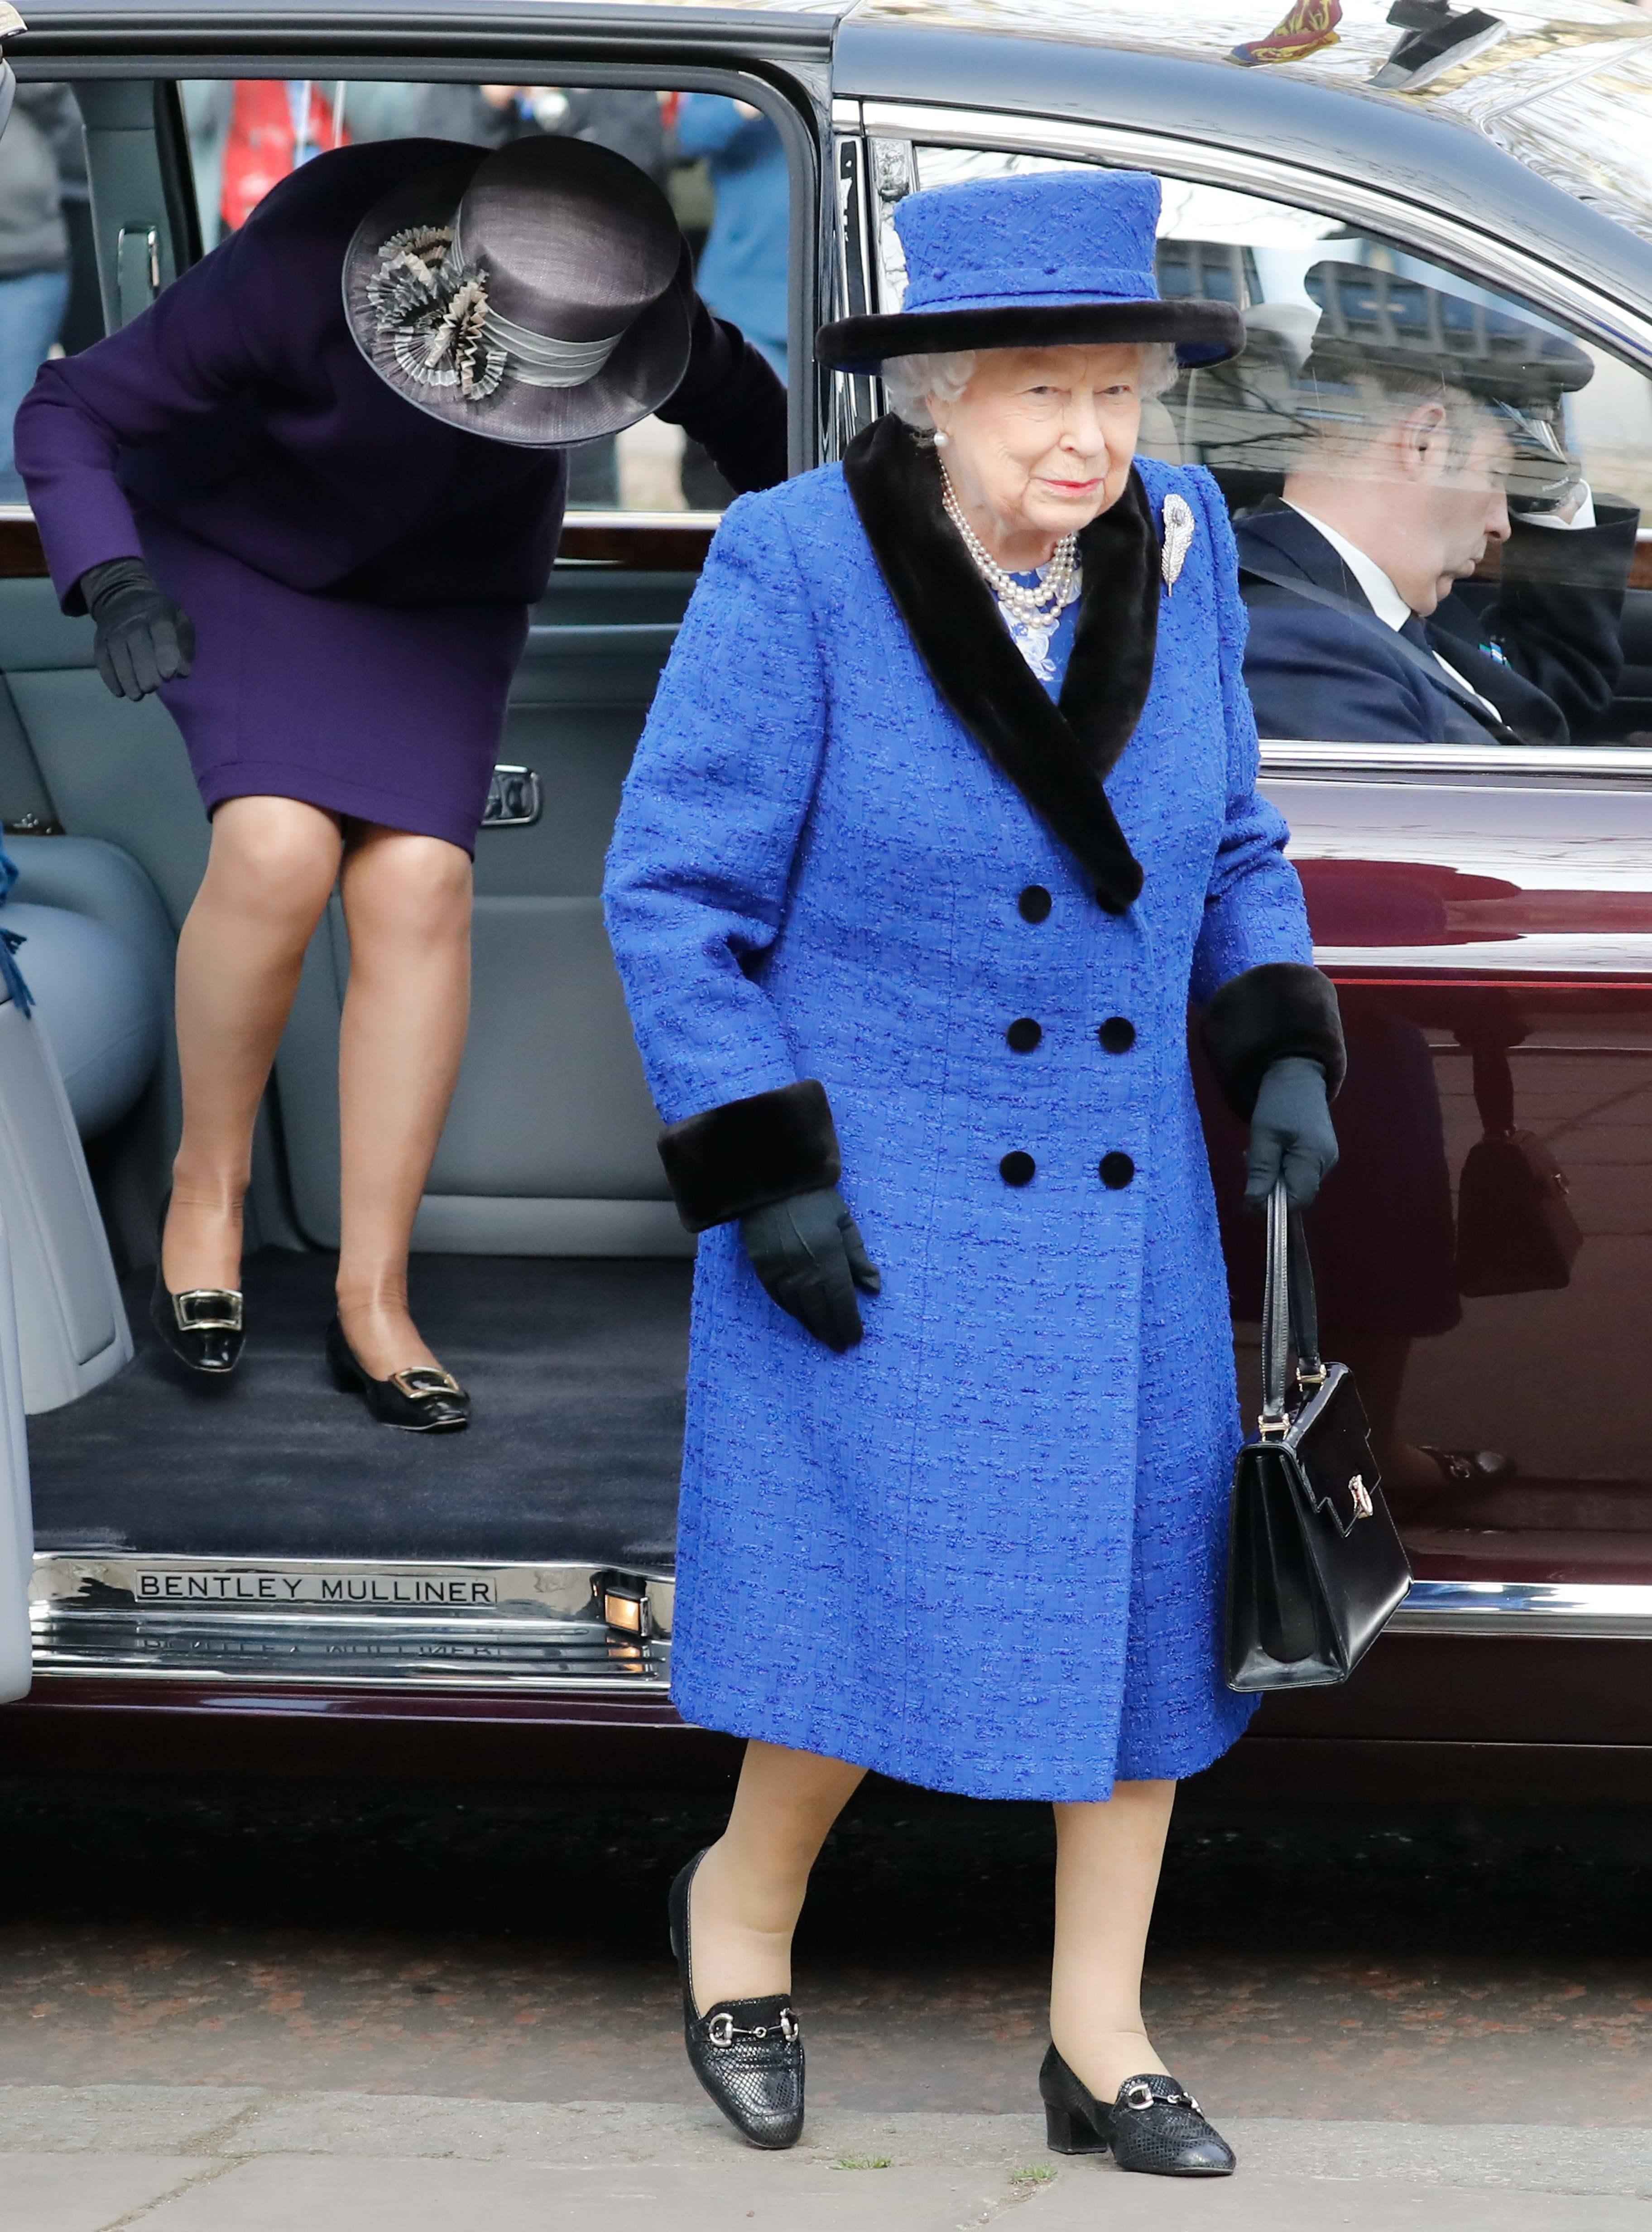 Елизавета II прибыла в Лондон на мероприятие